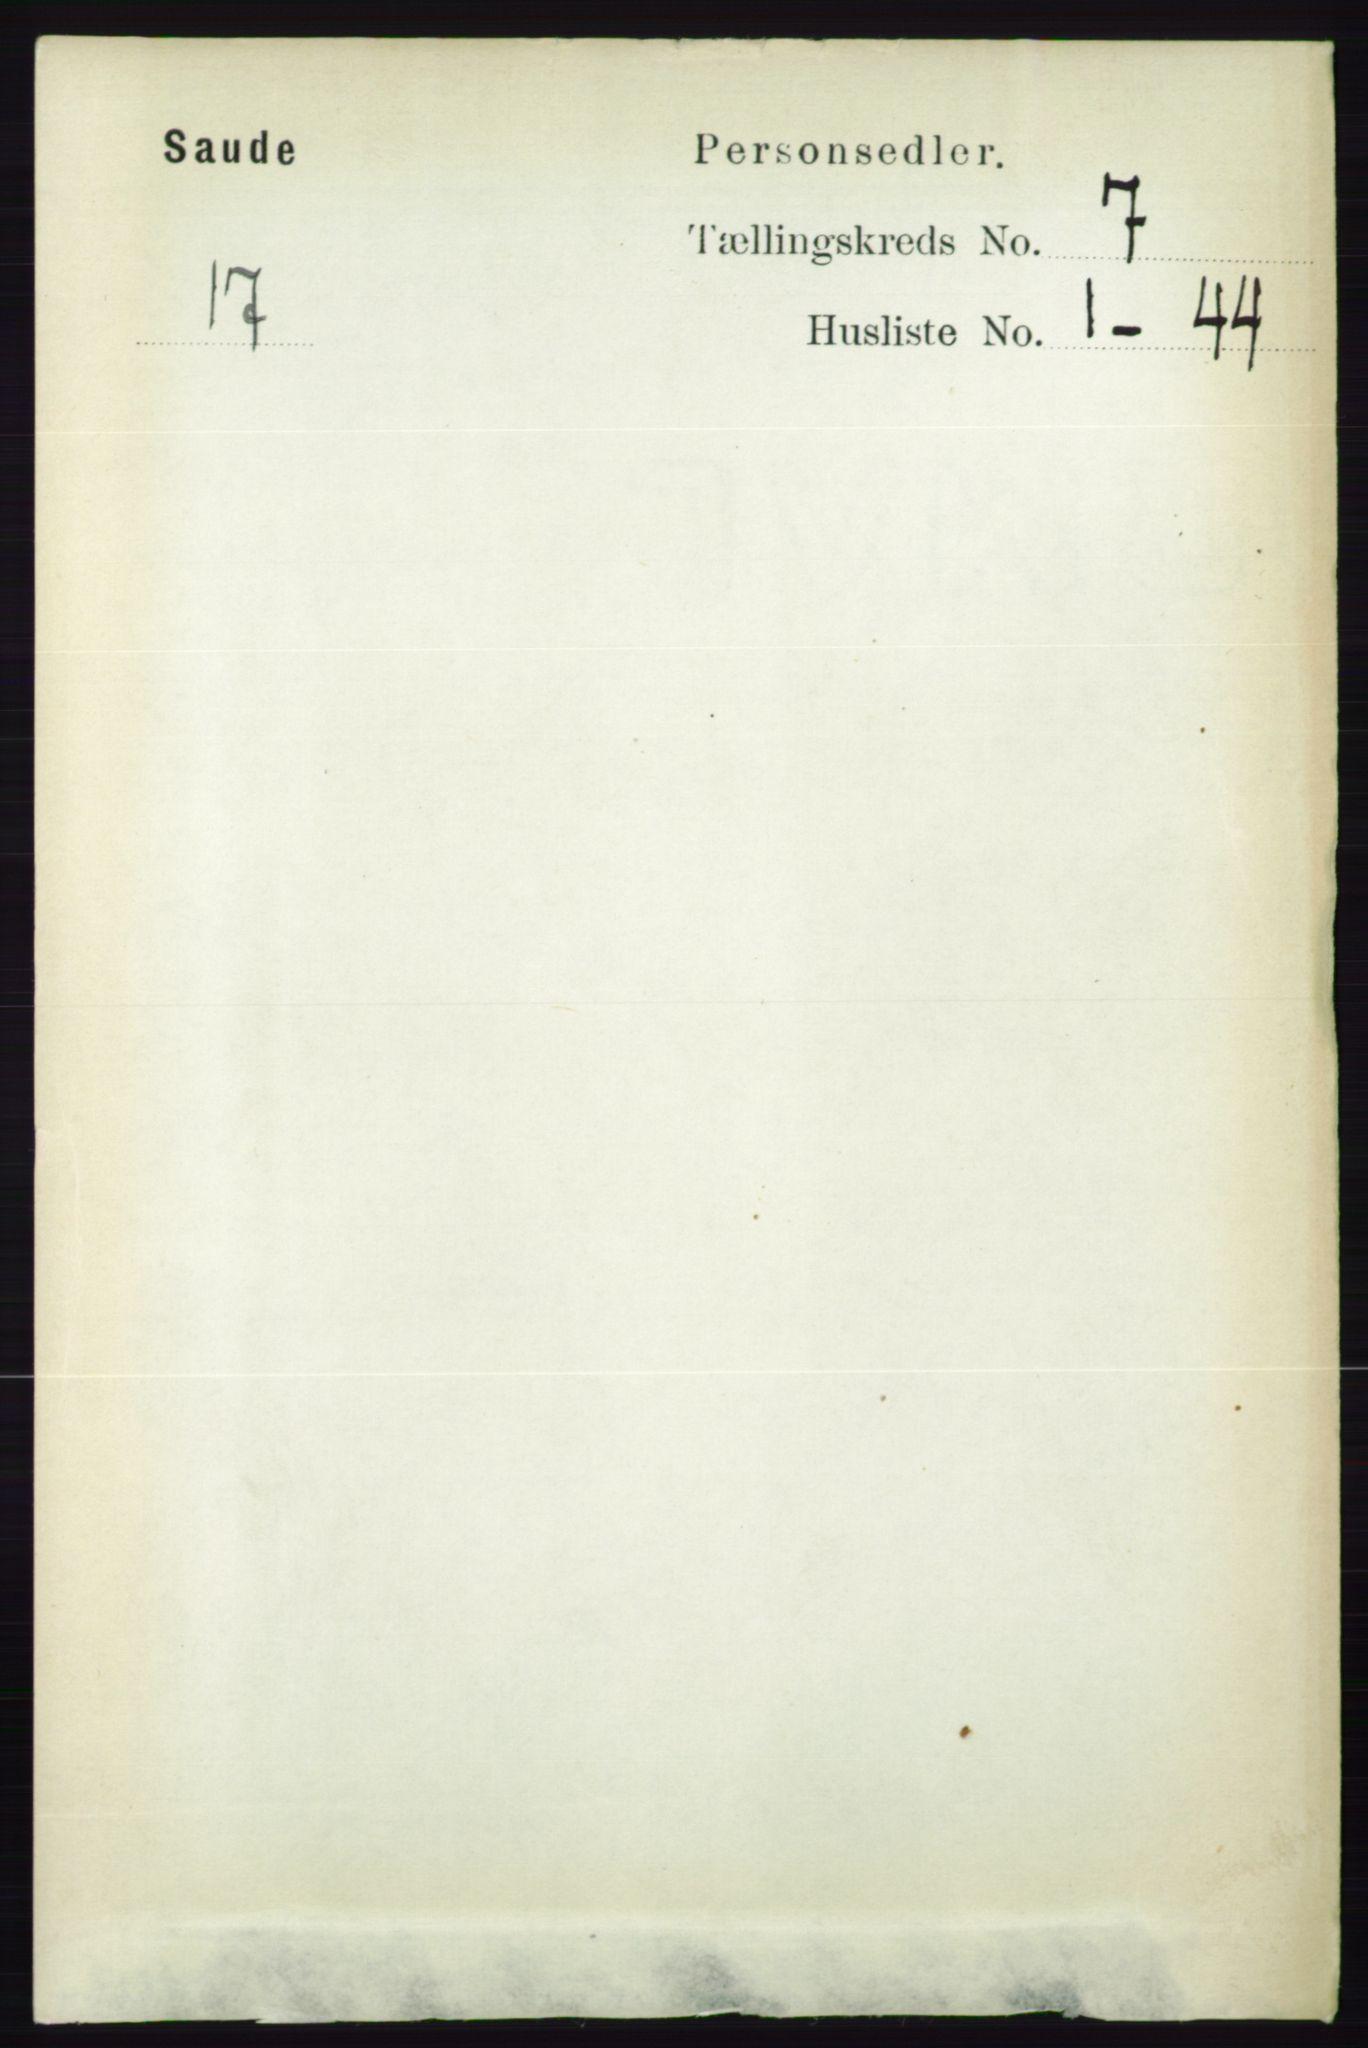 RA, Folketelling 1891 for 0822 Sauherad herred, 1891, s. 2029